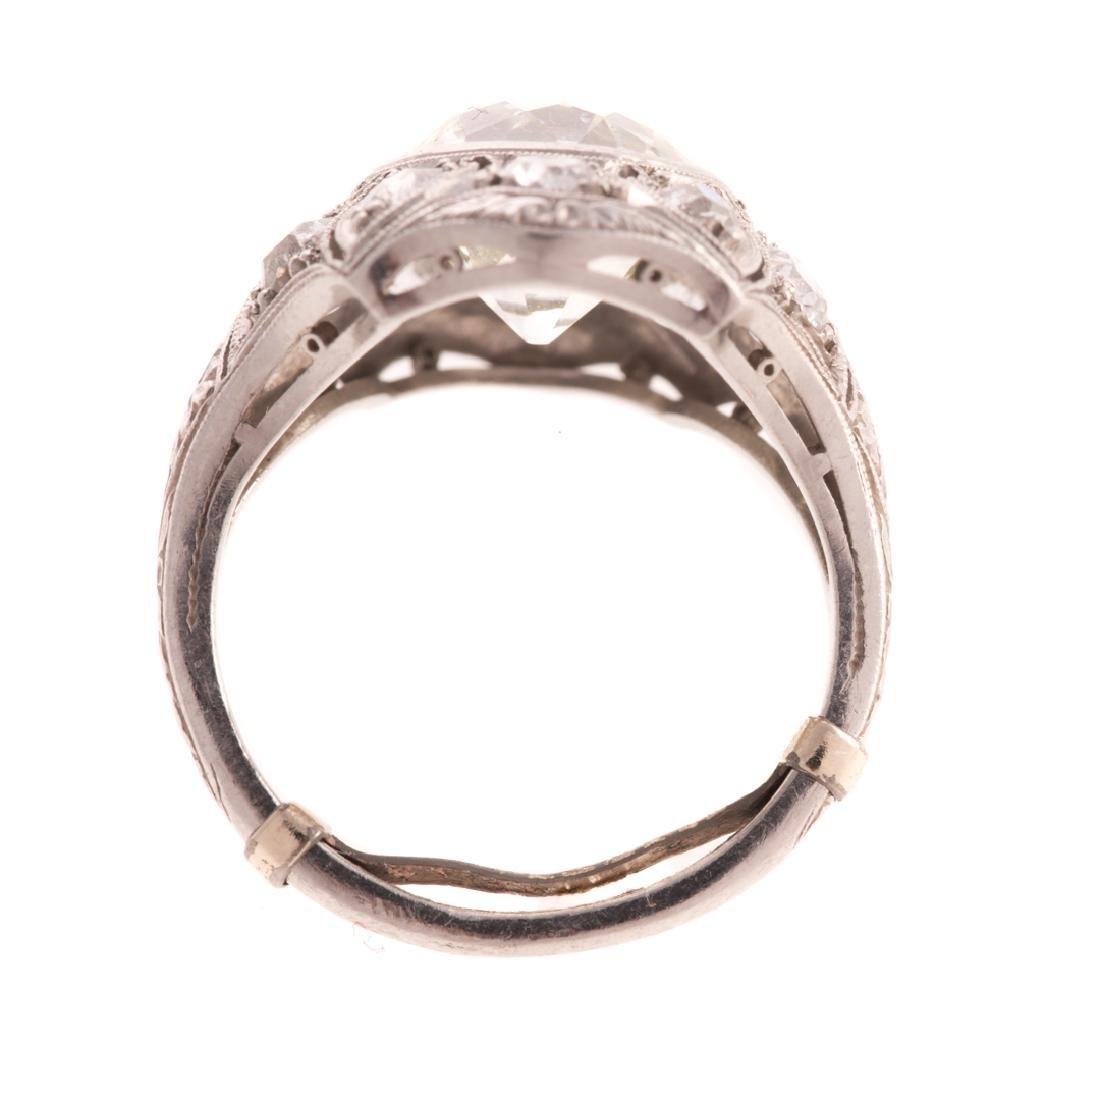 A Lady's 4.51 Diamond Art Deco Ring in Platinum - 3